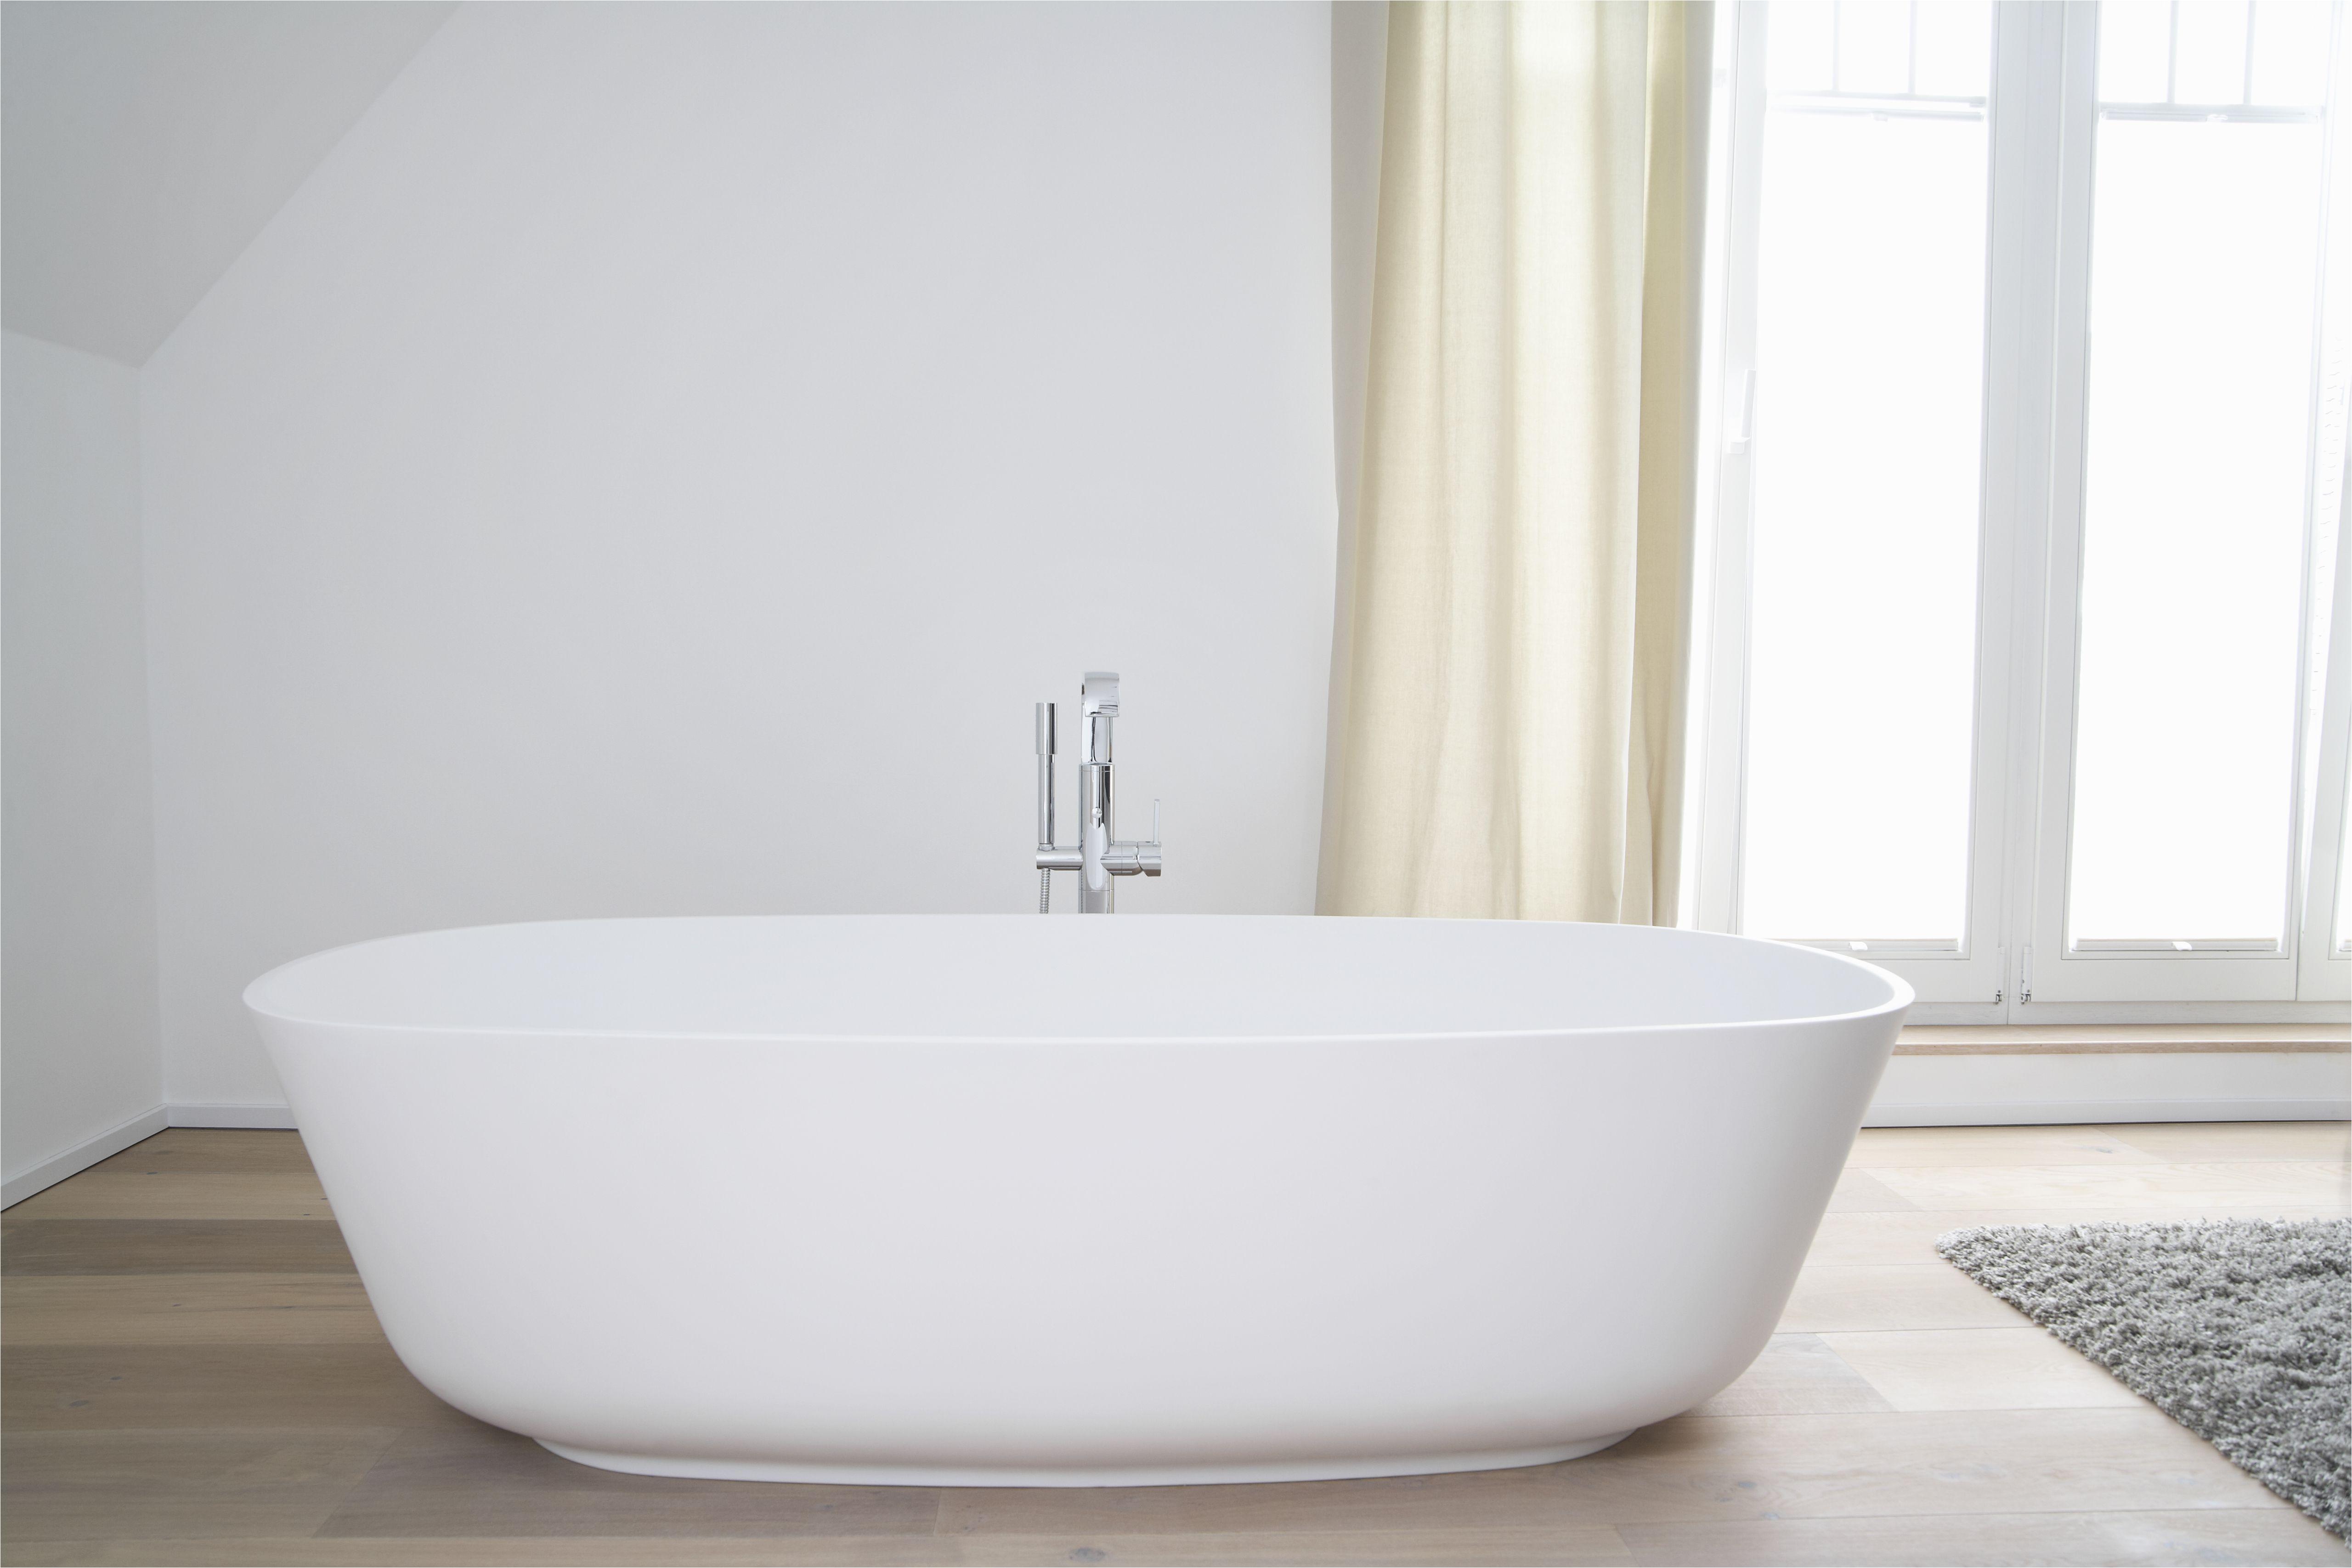 germany cologne bath tub 468797679 588be75f3df78caebcbfd6cd